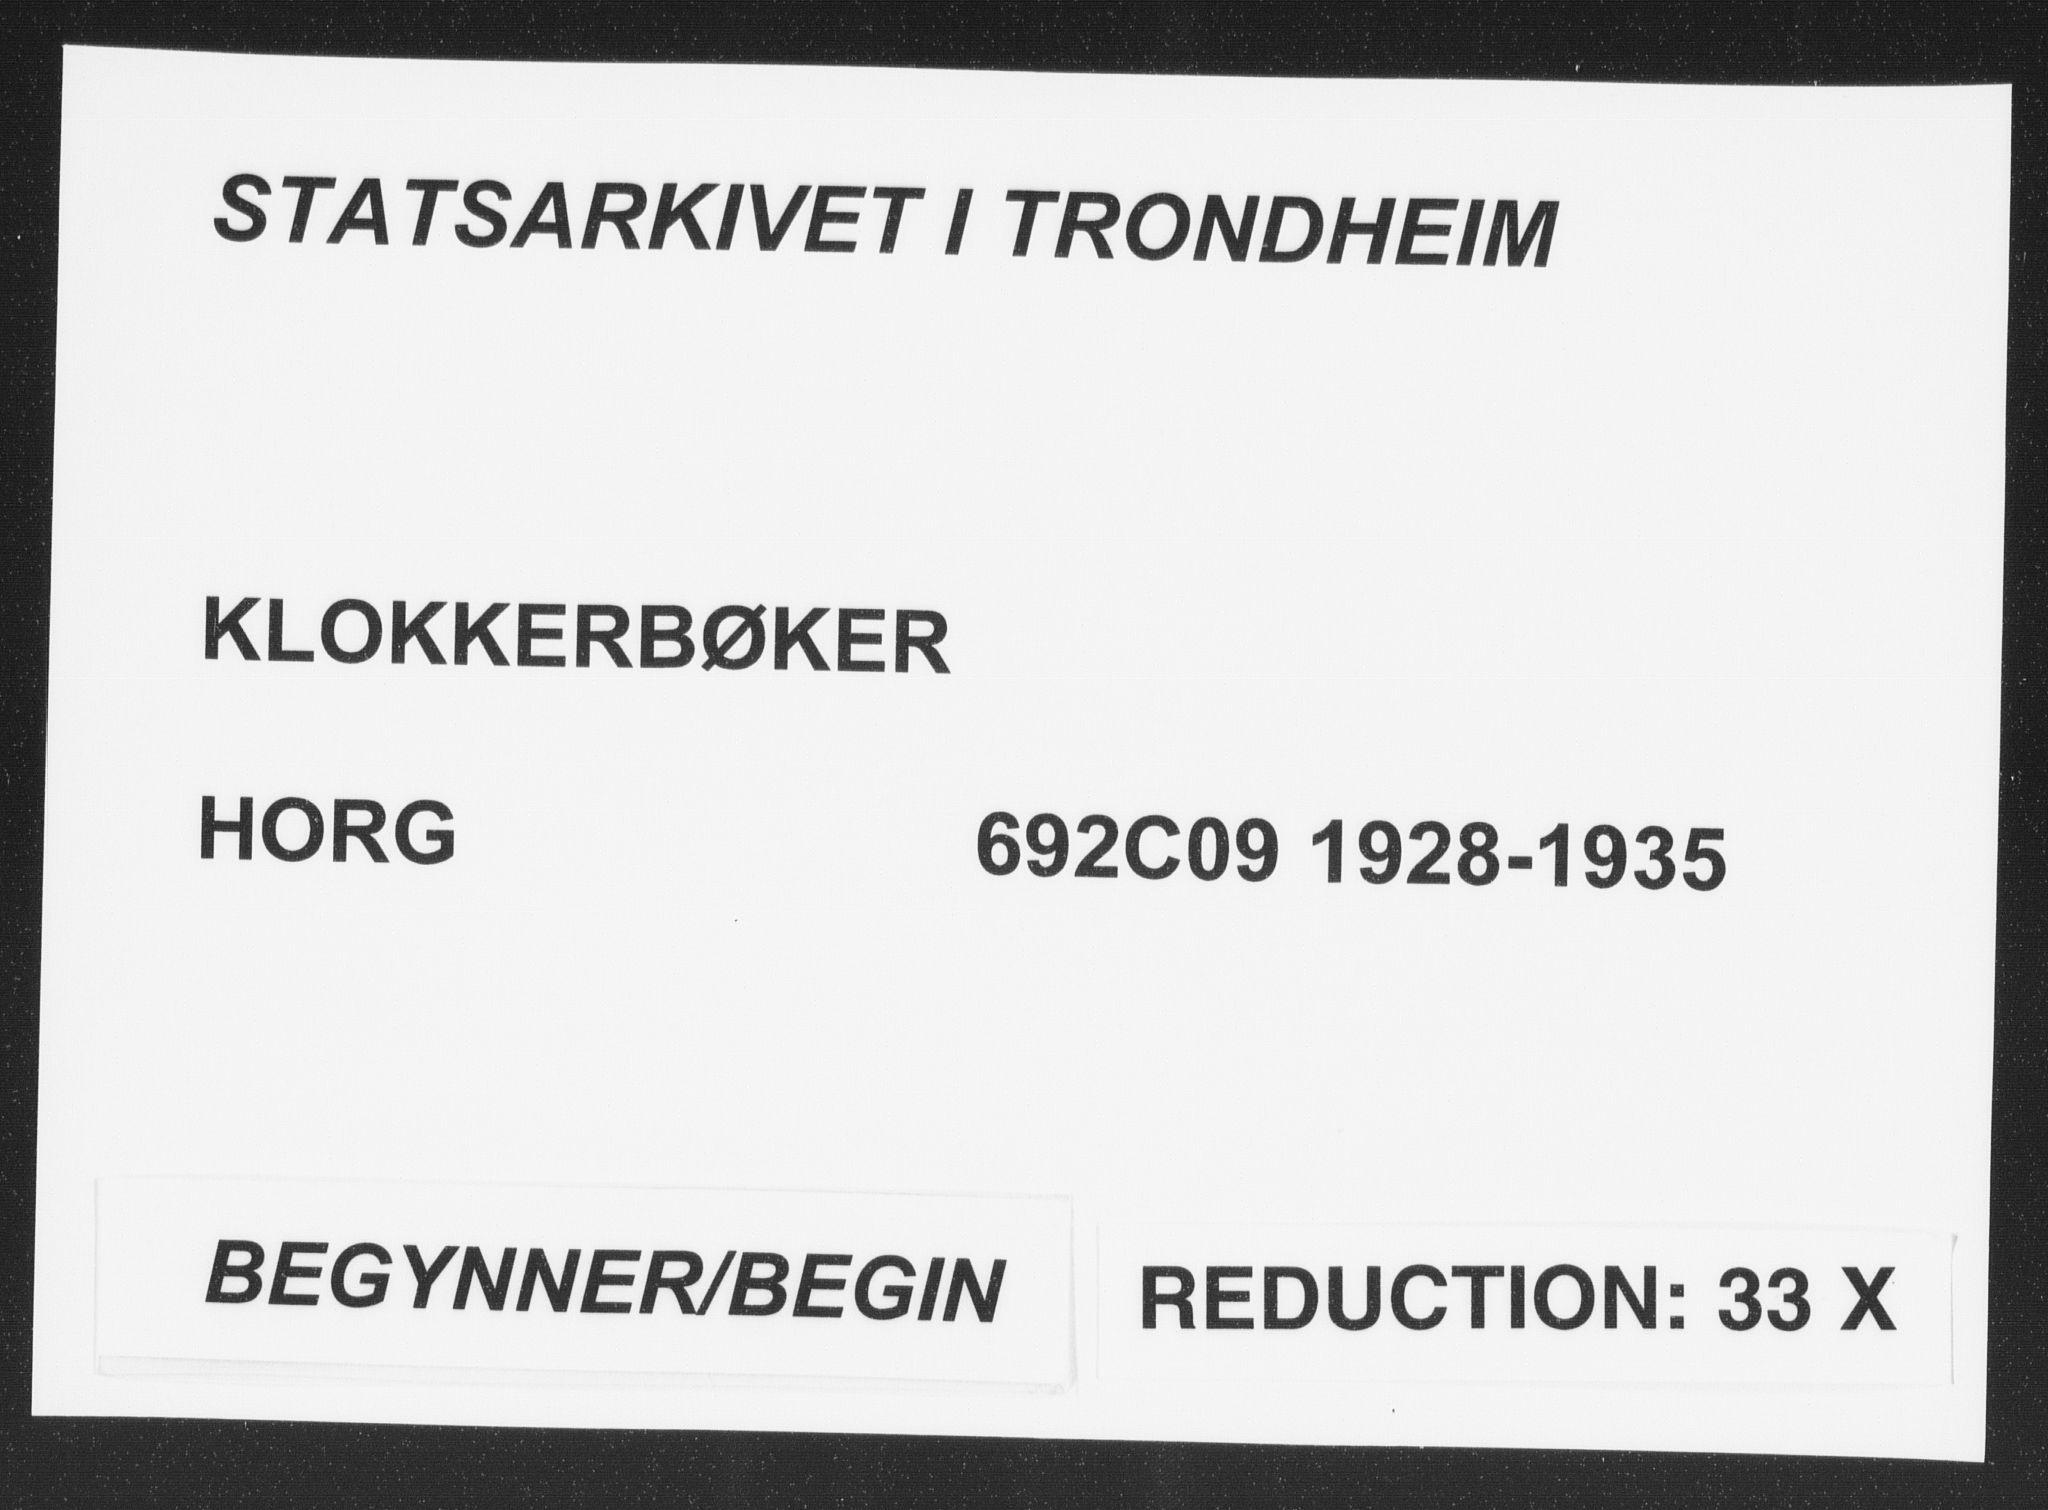 SAT, Ministerialprotokoller, klokkerbøker og fødselsregistre - Sør-Trøndelag, 692/L1114: Parish register (copy) no. 692C09, 1928-1935